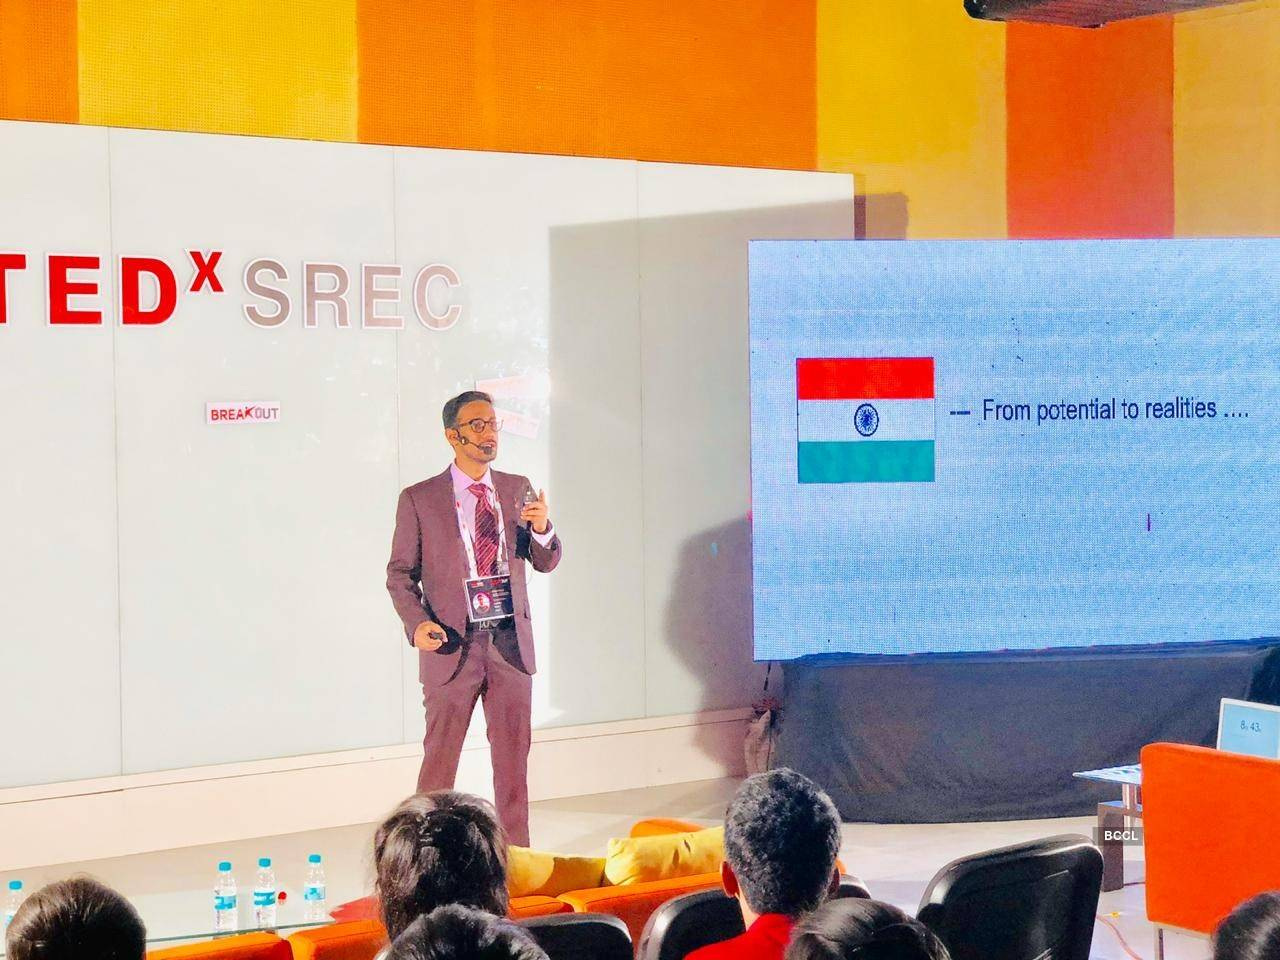 Meet Pratik Gauri, the man behind the Impact World Tour to create the 5th Industrial Revolution